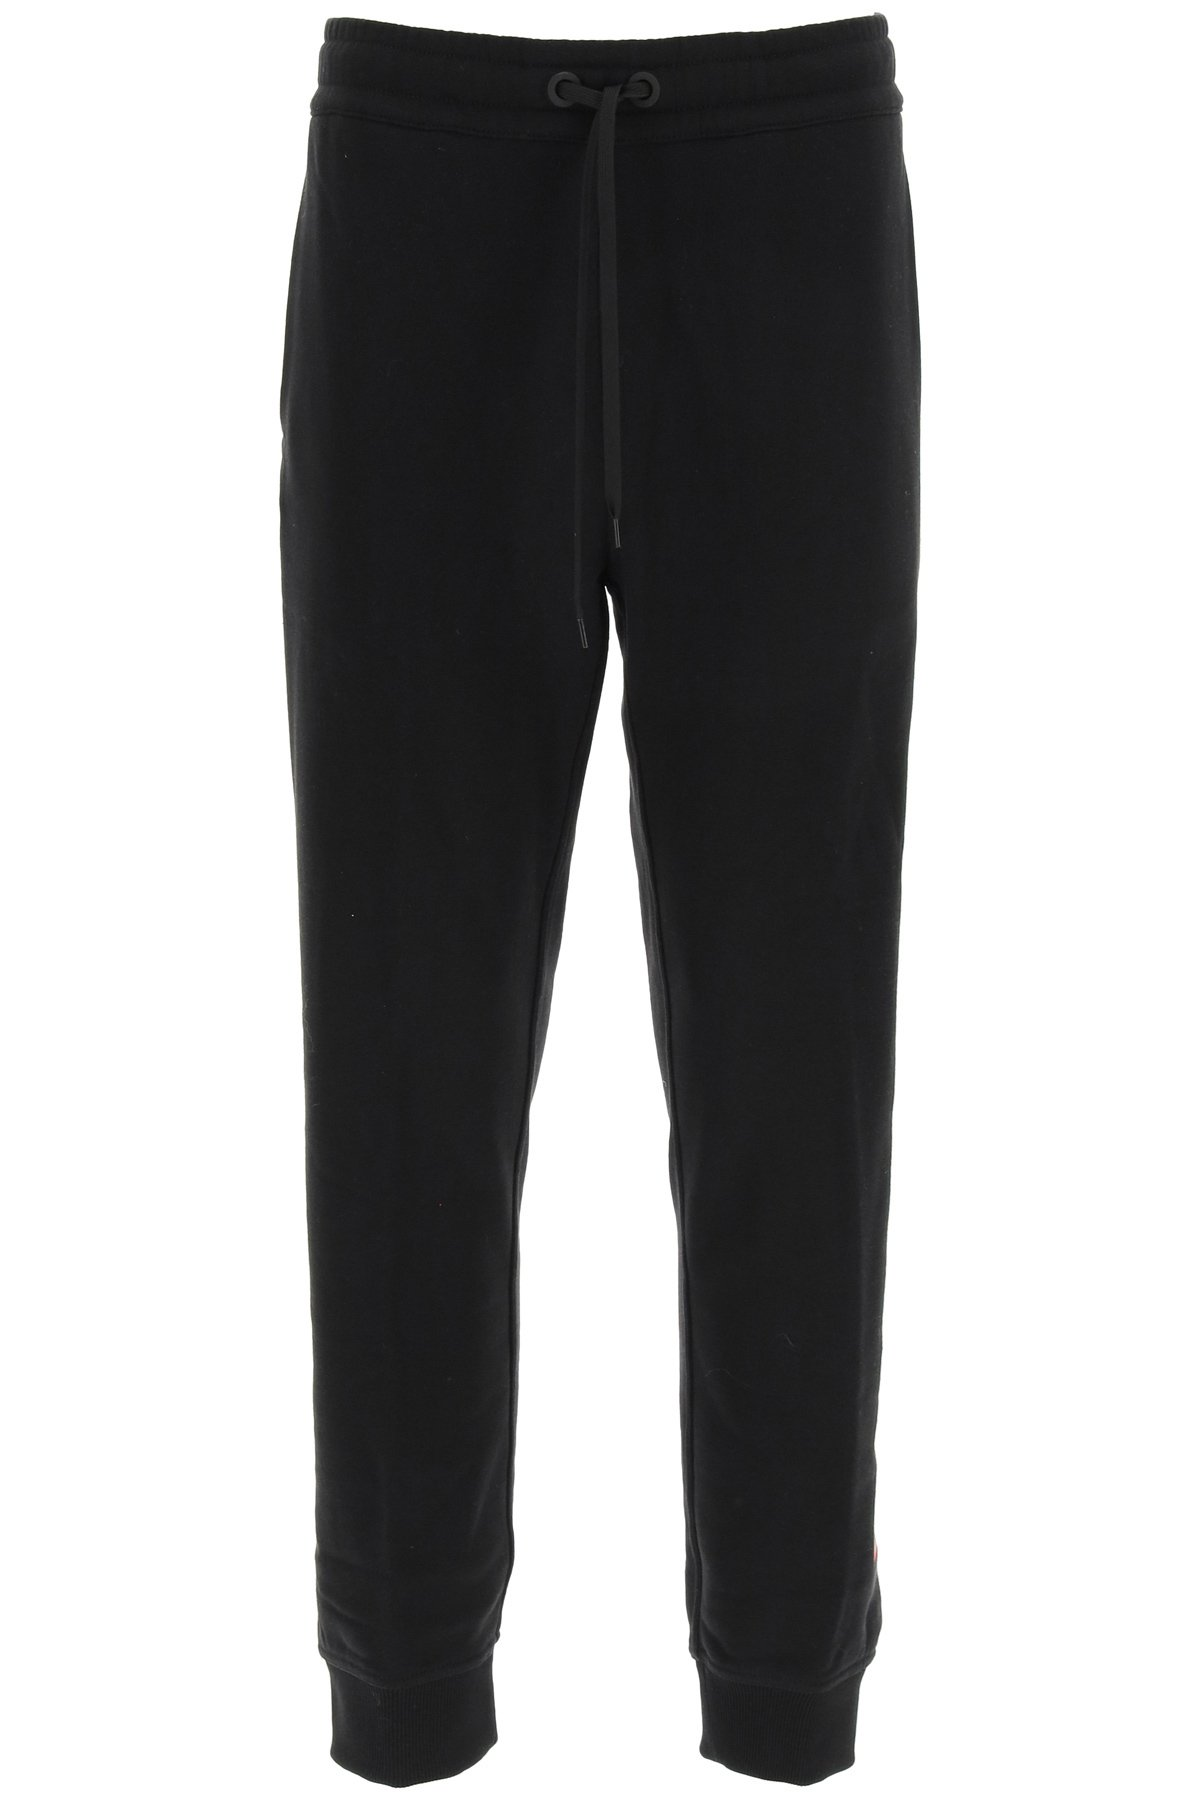 Burberry pantaloni esmee con stampa logo